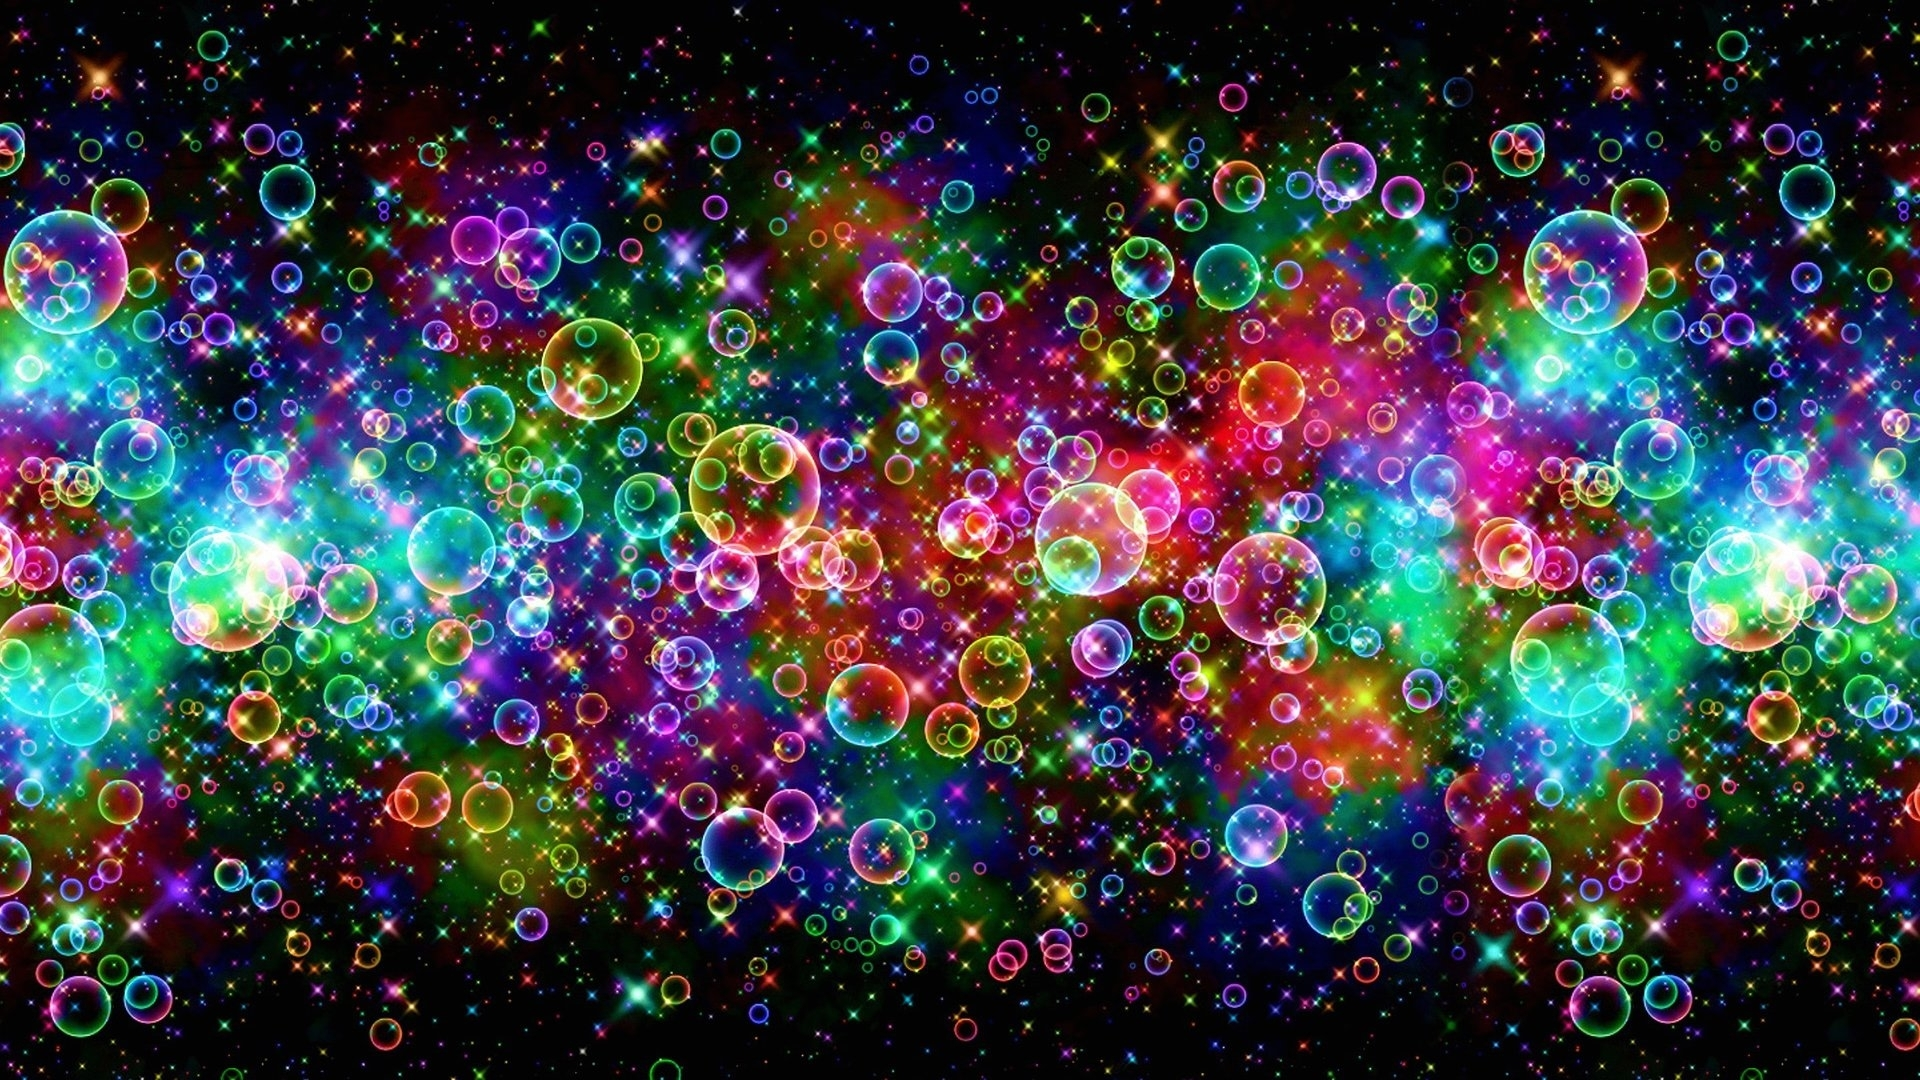 wallpaper balls and lights abstract 1920 x 1080 full hd - 1920 x